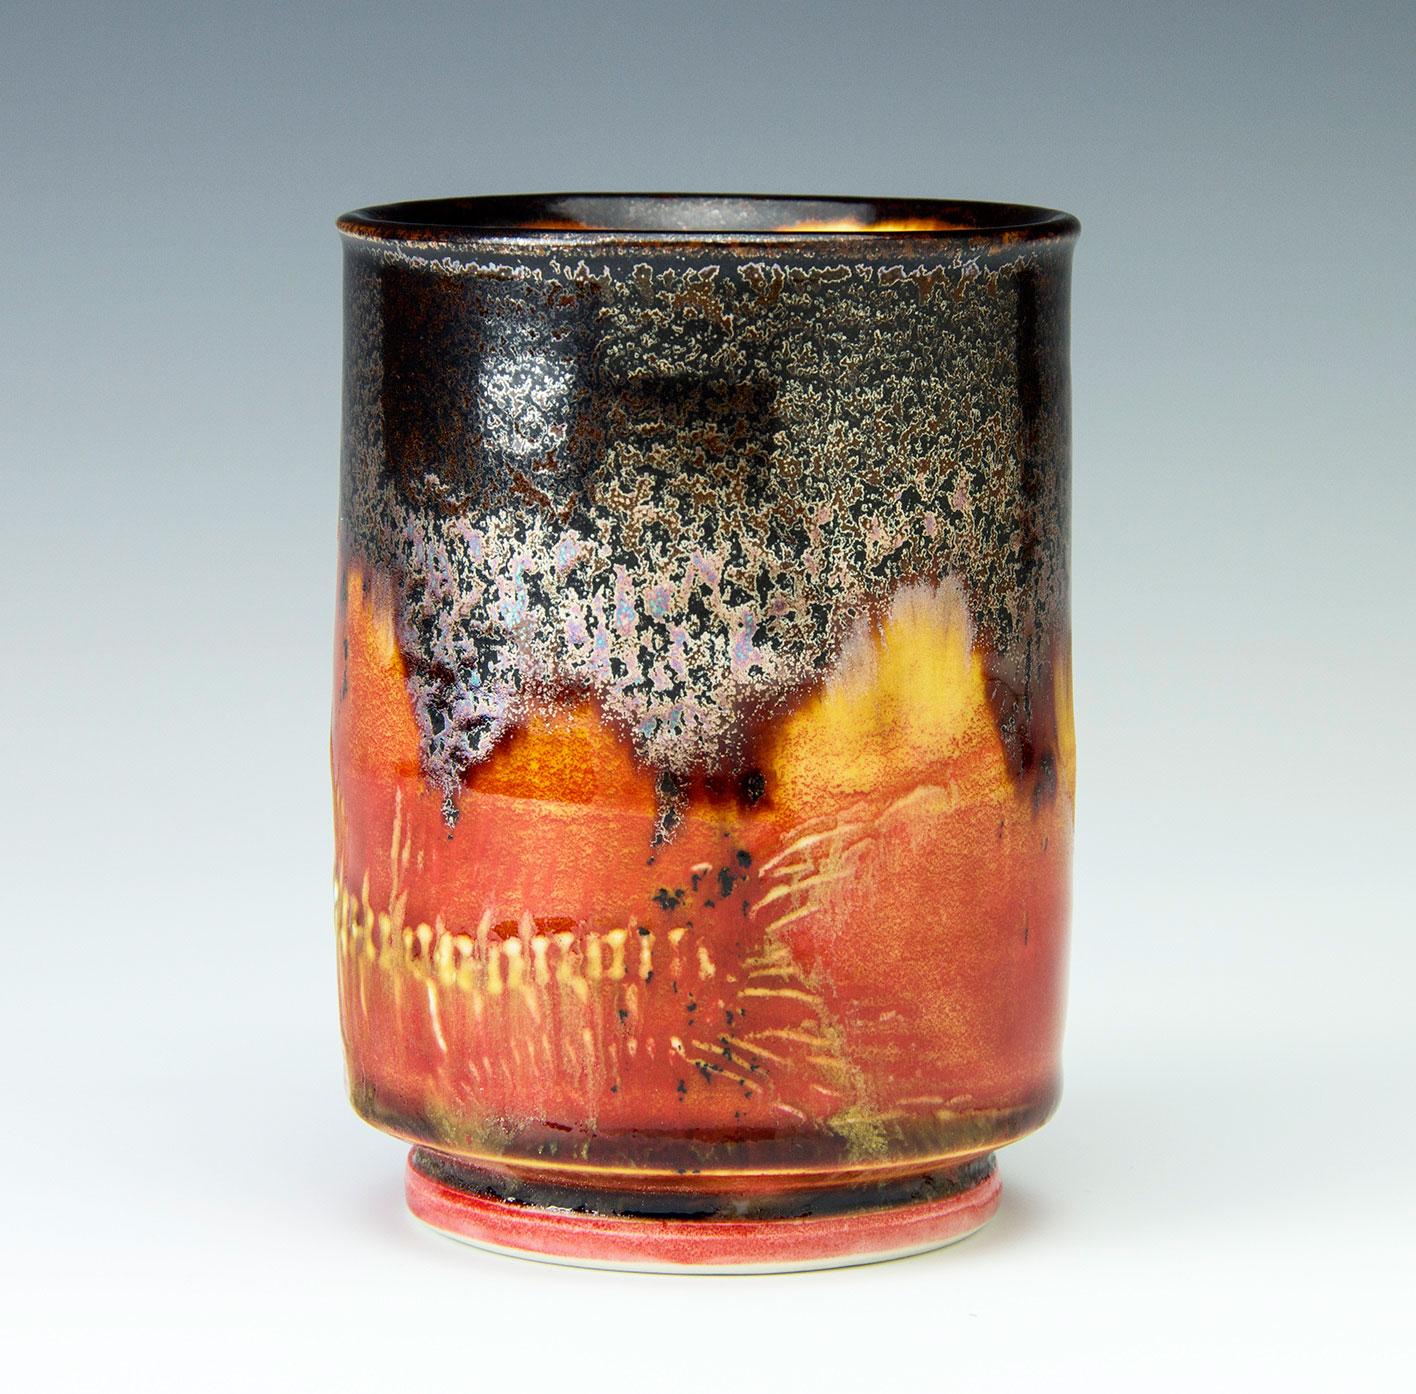 Art-Pottery-Cup-Bruce-Gholson-North-Carolina.jpg